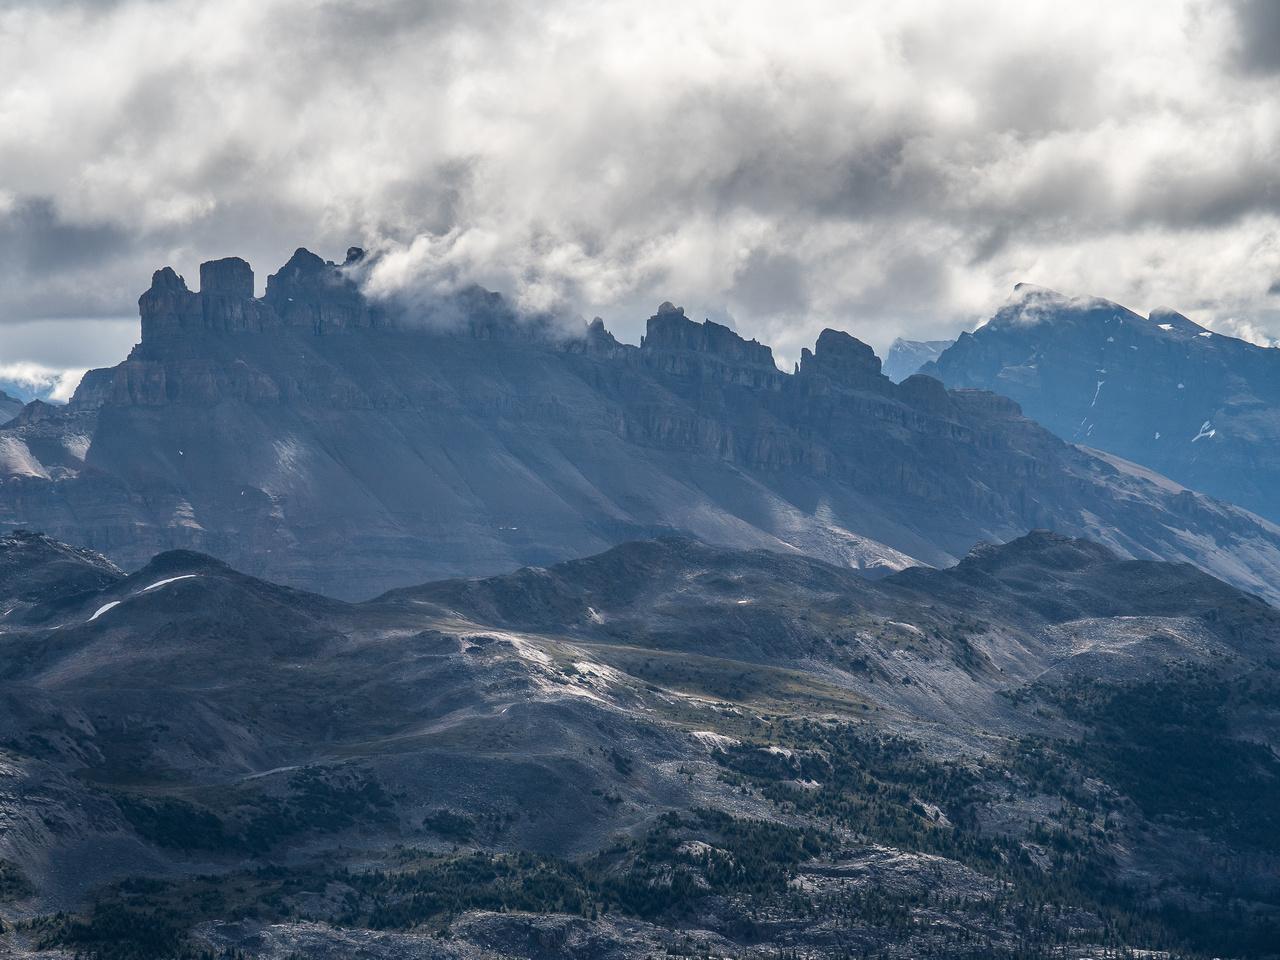 Dolomite Peak is also very distinctive.